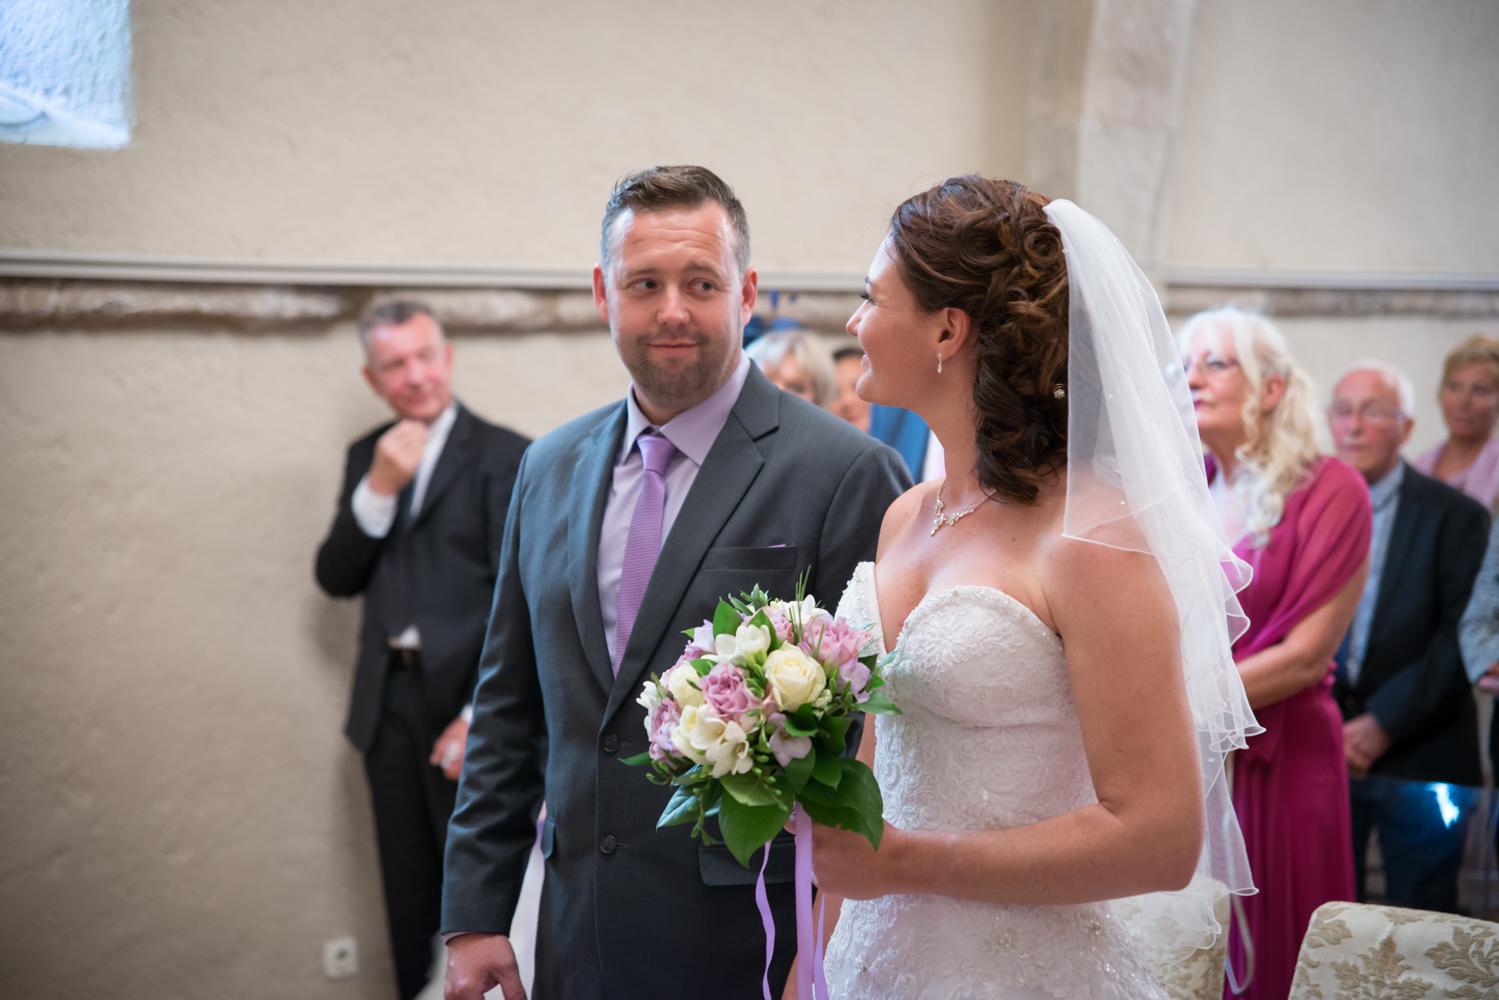 JLP photographe mariage Var et PACA (25)